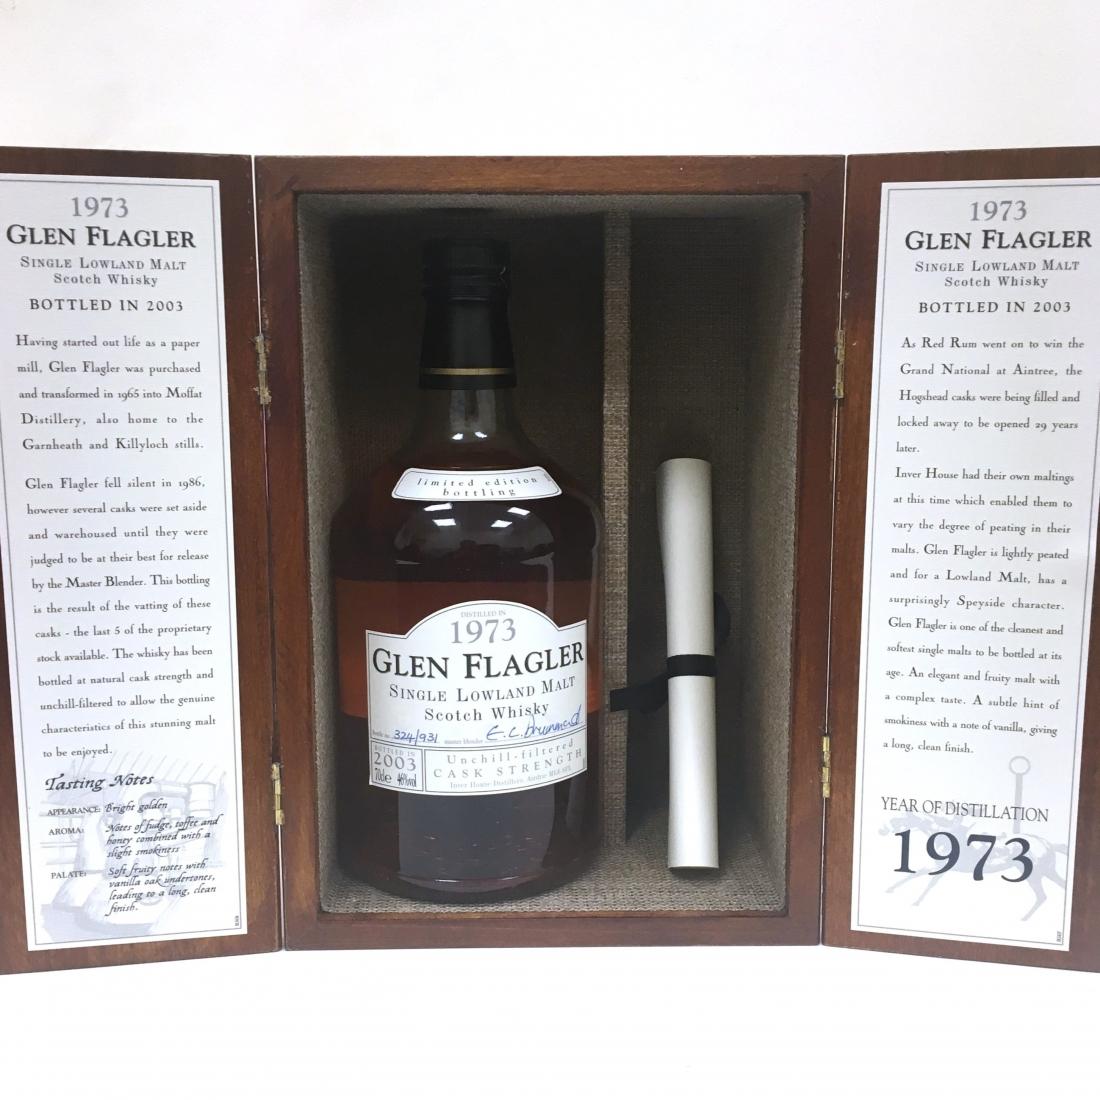 Glen Flagler 1973 30 Year Old